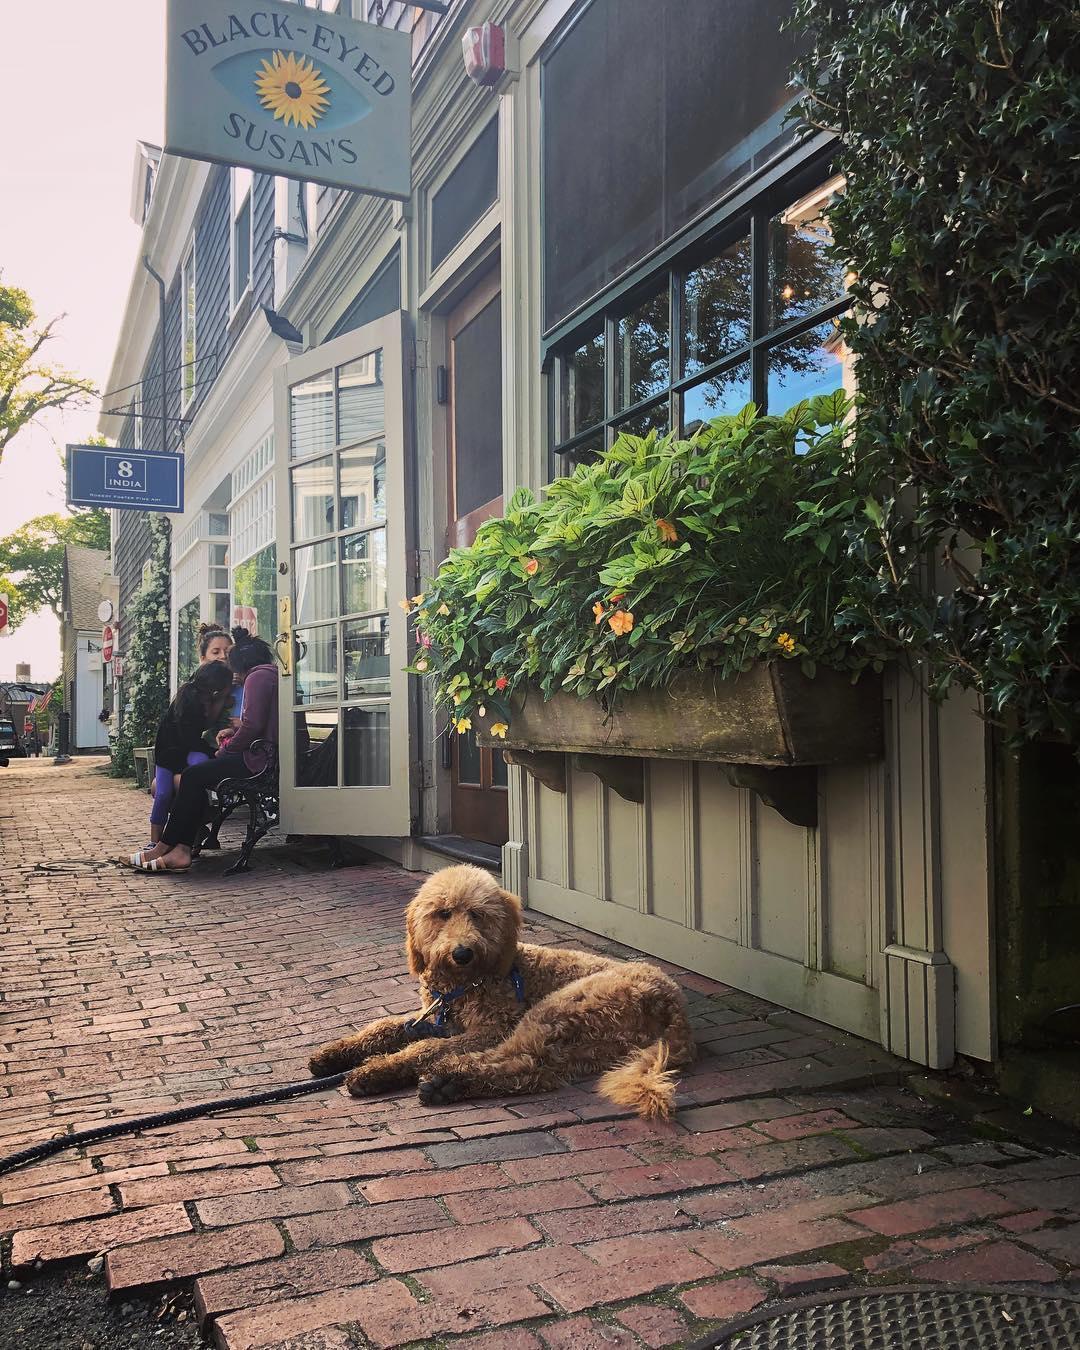 Black-Eyed Susan's in Nantucket is dog friendly